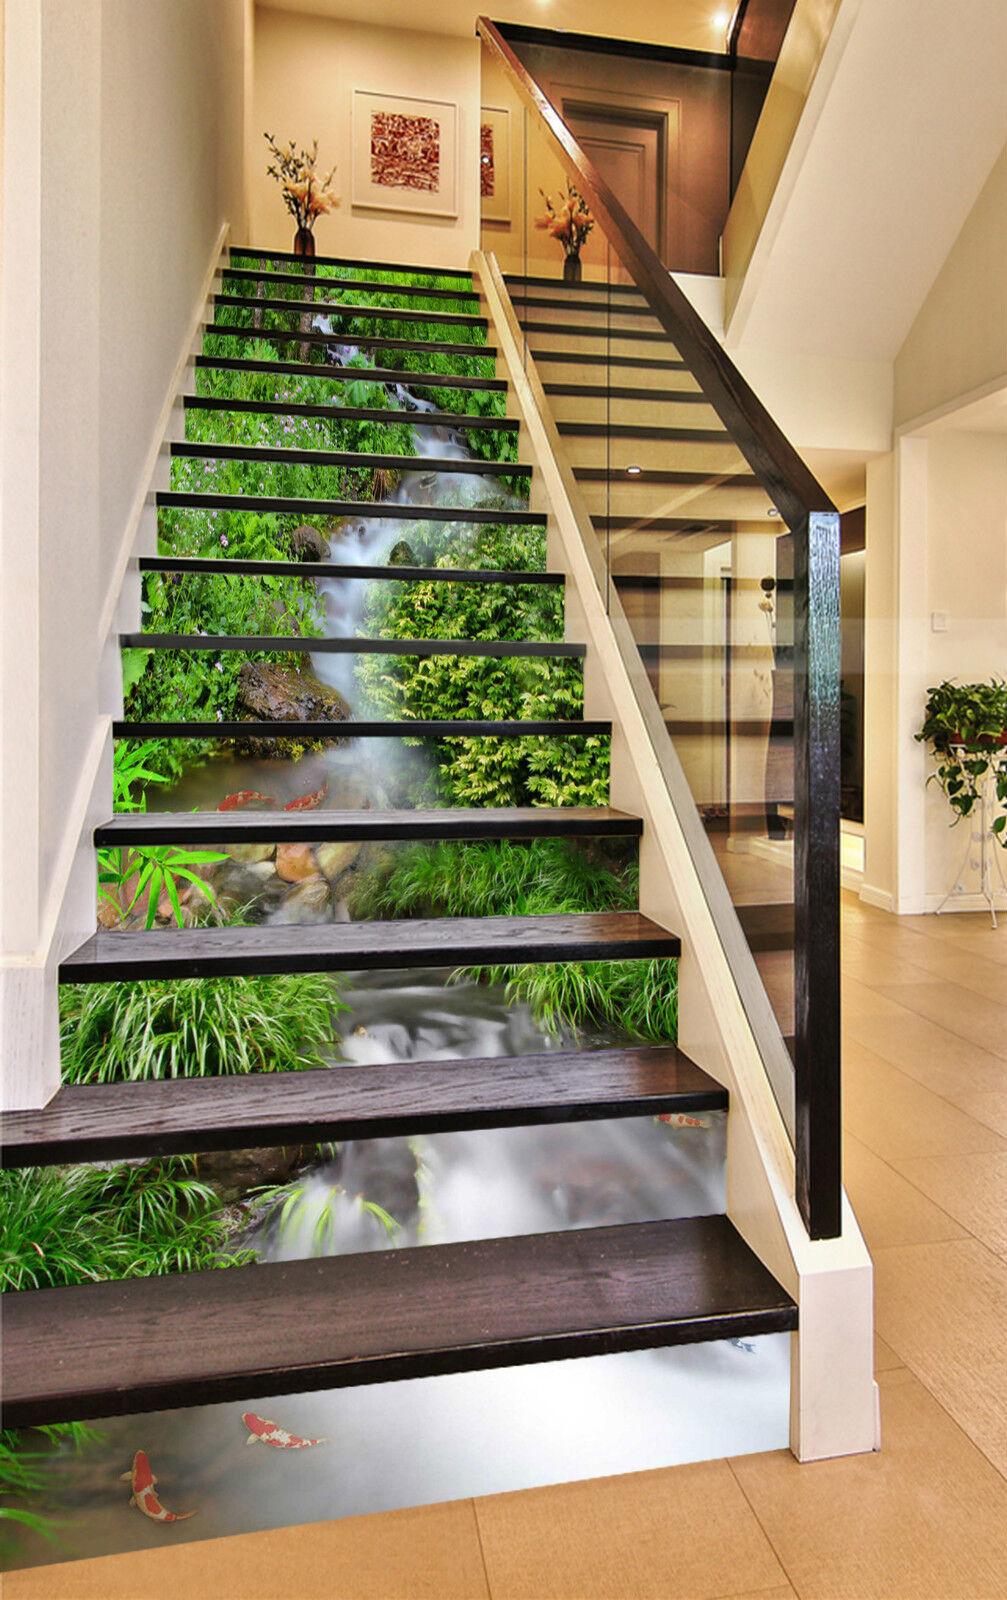 3D Bach Wald 369 Stair Risers Dekoration Fototapete Vinyl Aufkleber Tapete DE